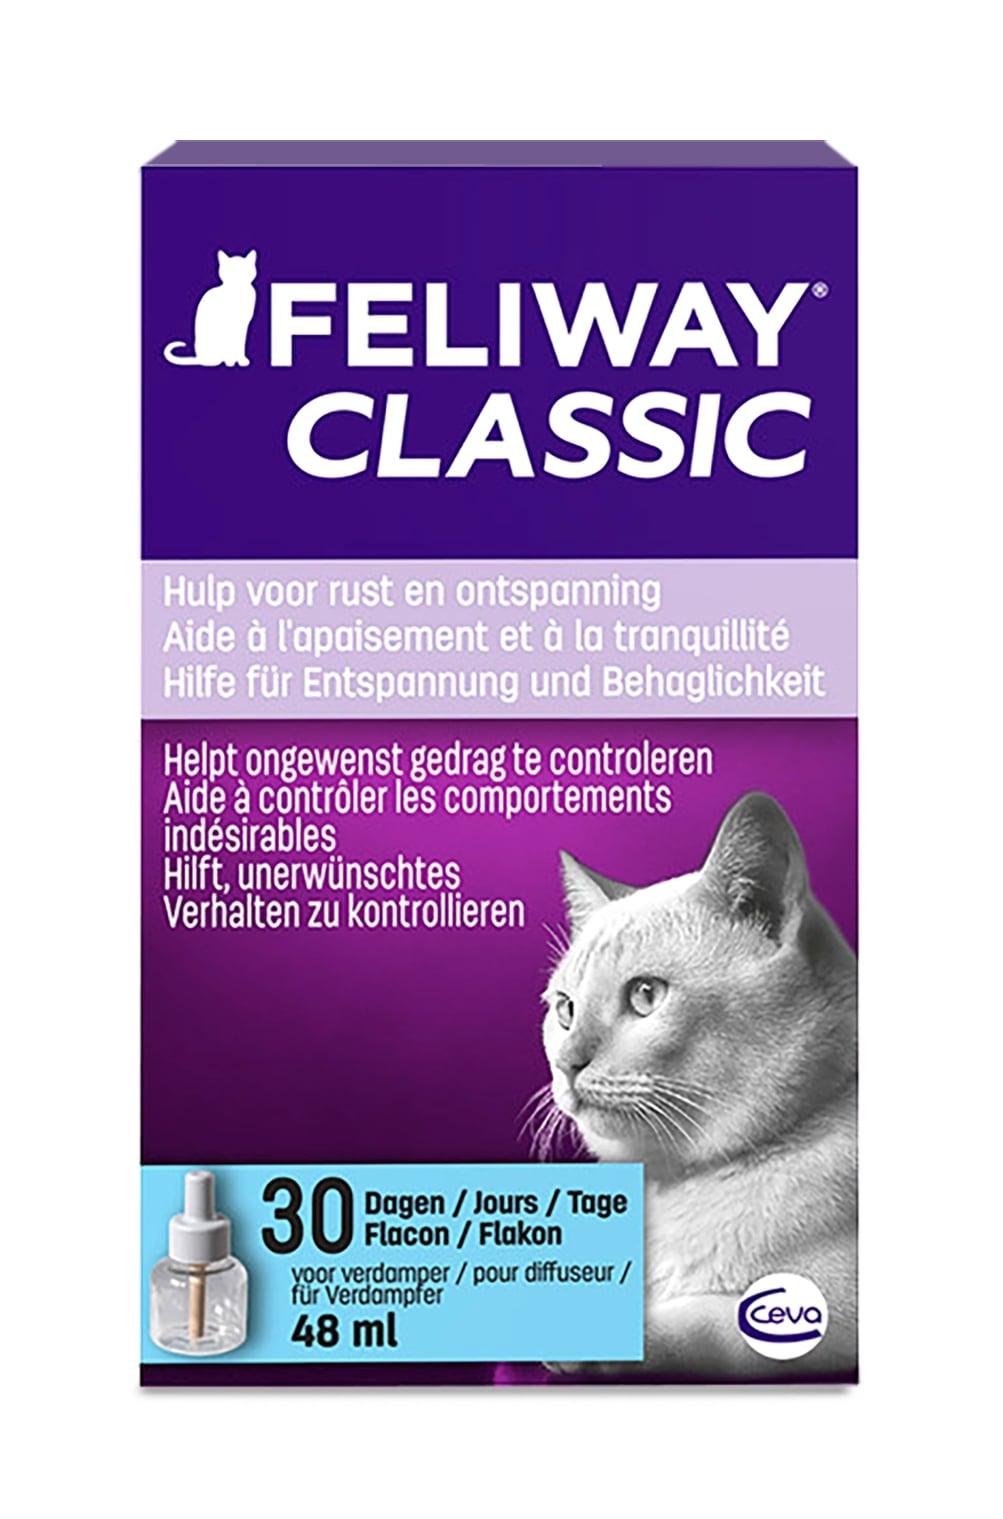 CE FELIWAY CLASSIC NAVULL.48ML 00001